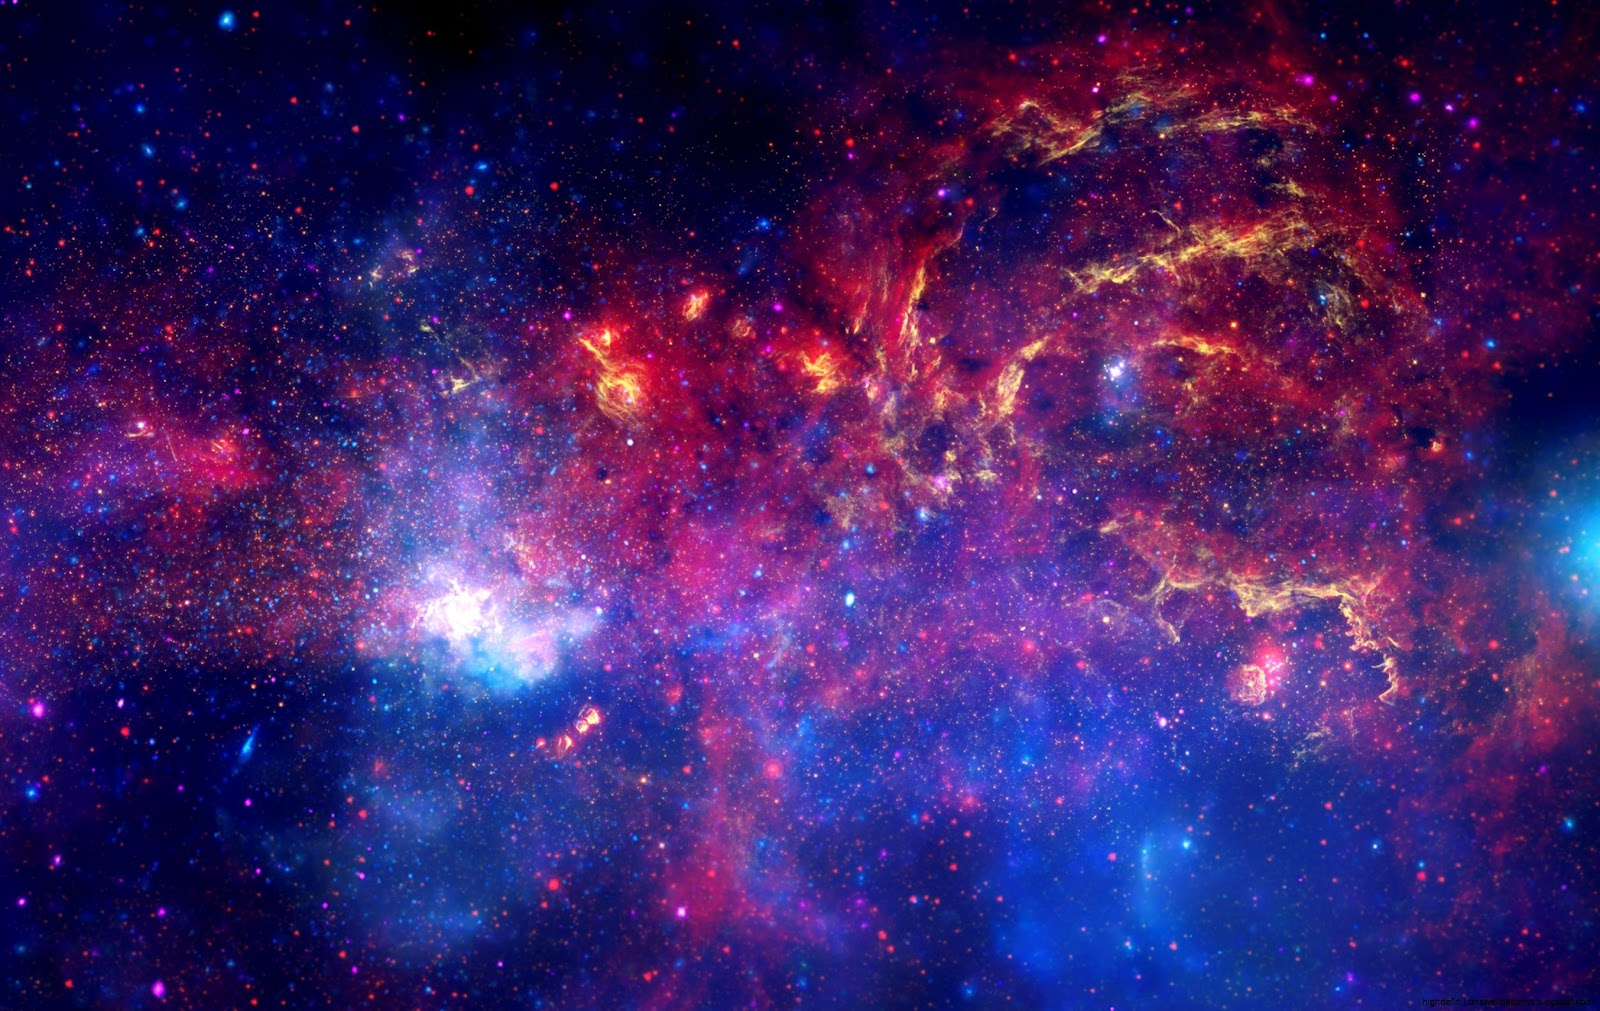 Space Nebula Purple Widescreen Hd Wallpaper | High ...